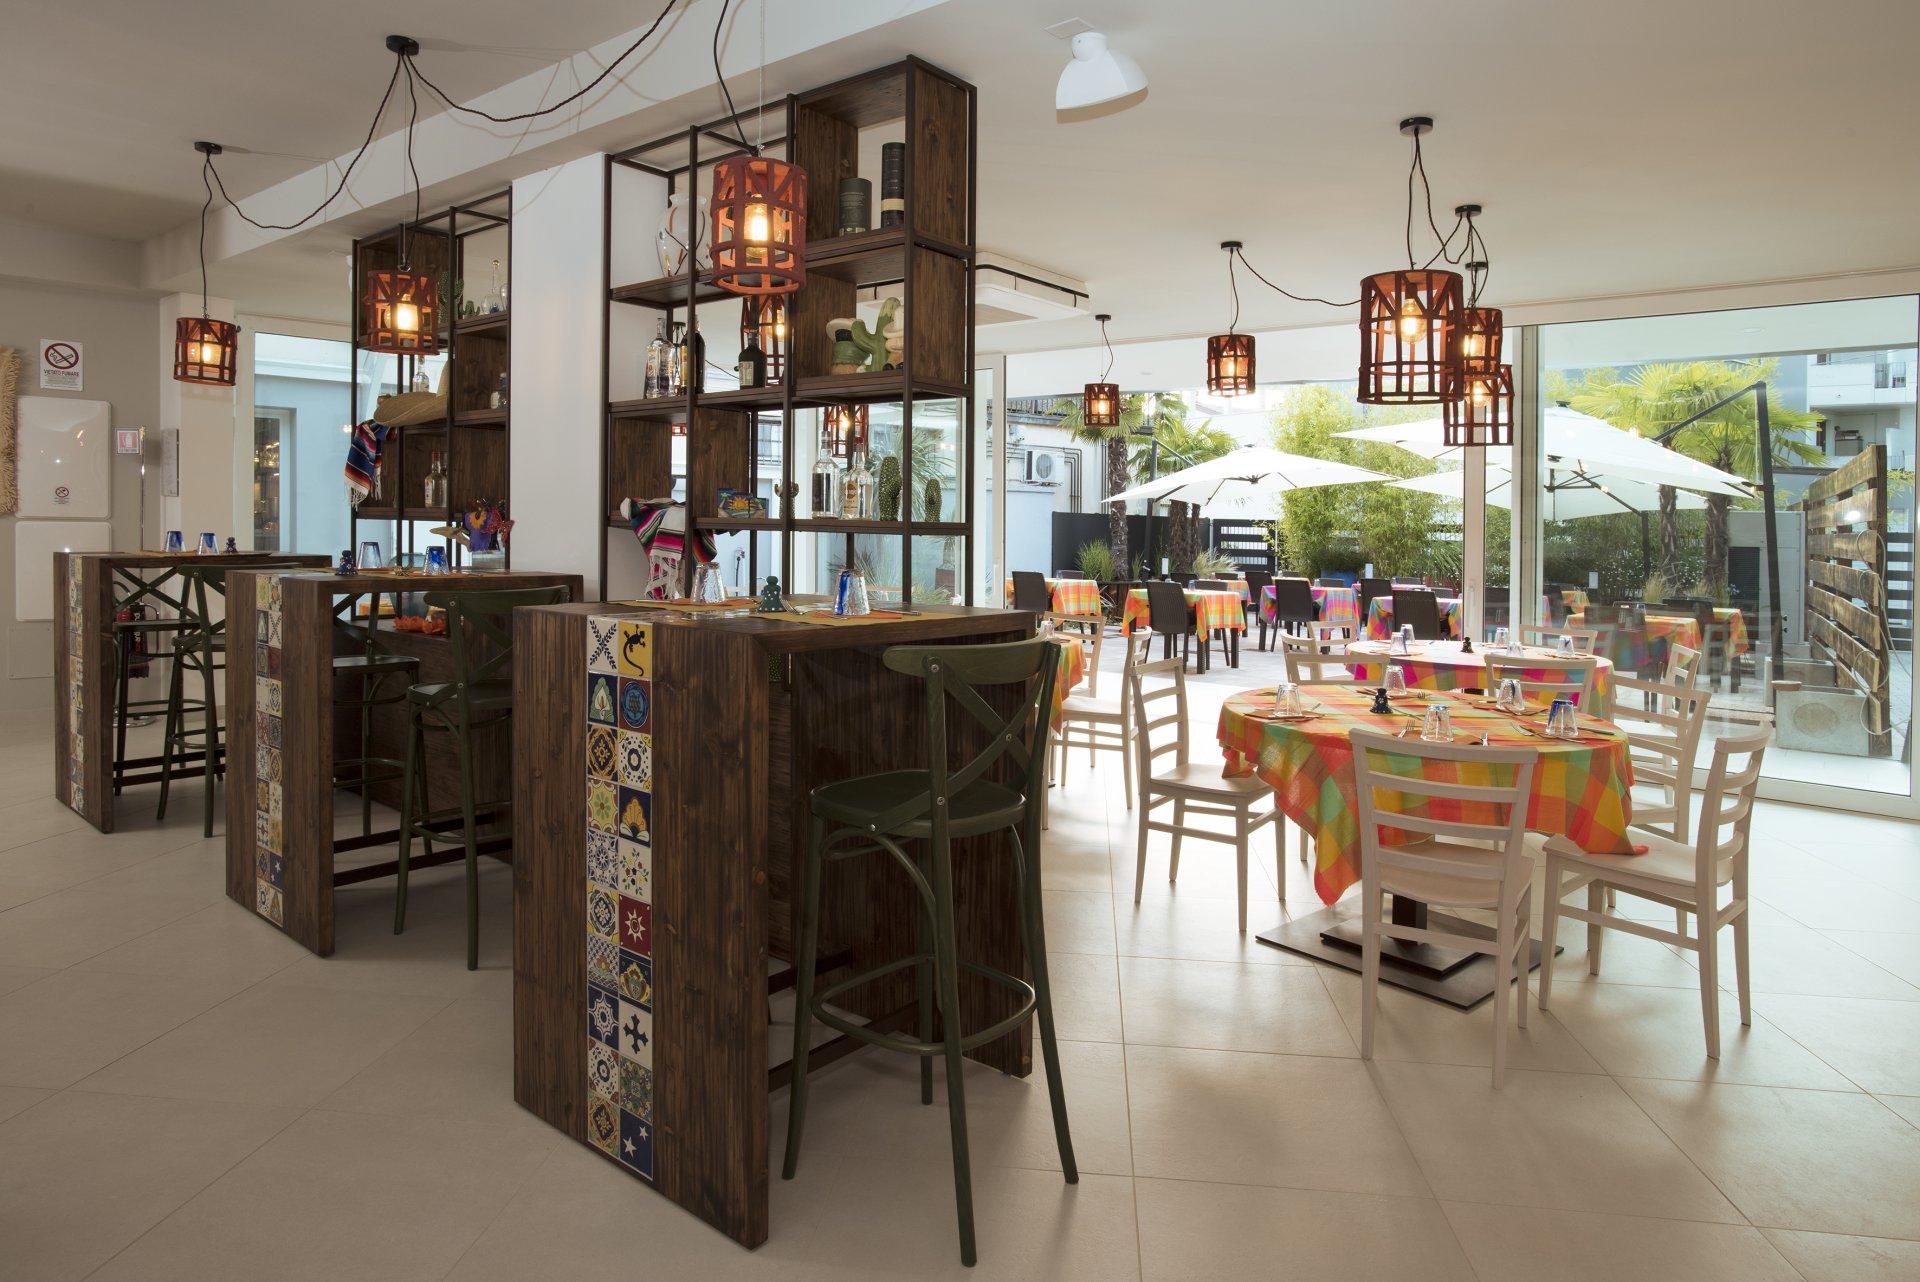 Arredamento ristorante ristorante padova biwo design for Arredamento etnico padova